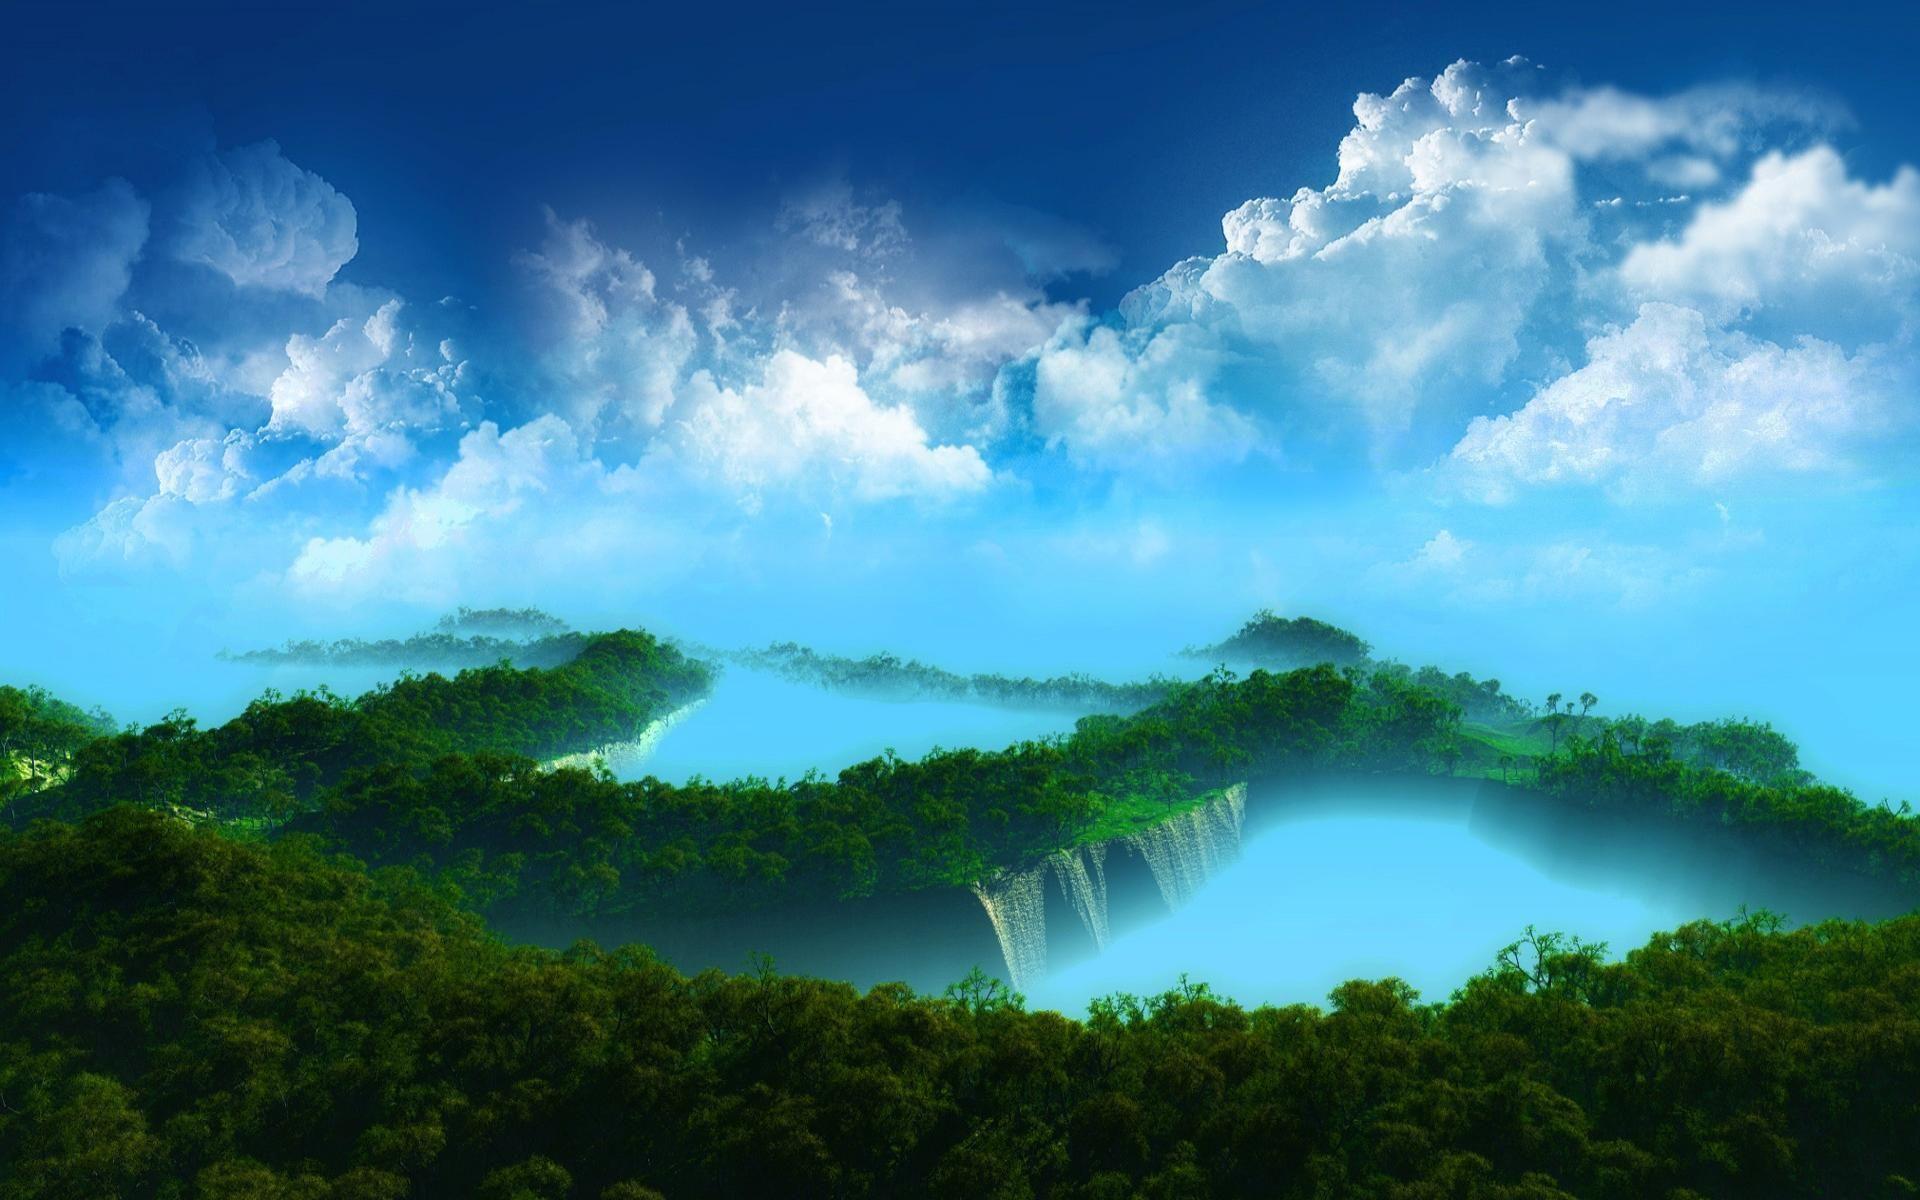 Beautiful Hd Wallpapers For Desktop Hd Nature Wallpapers New